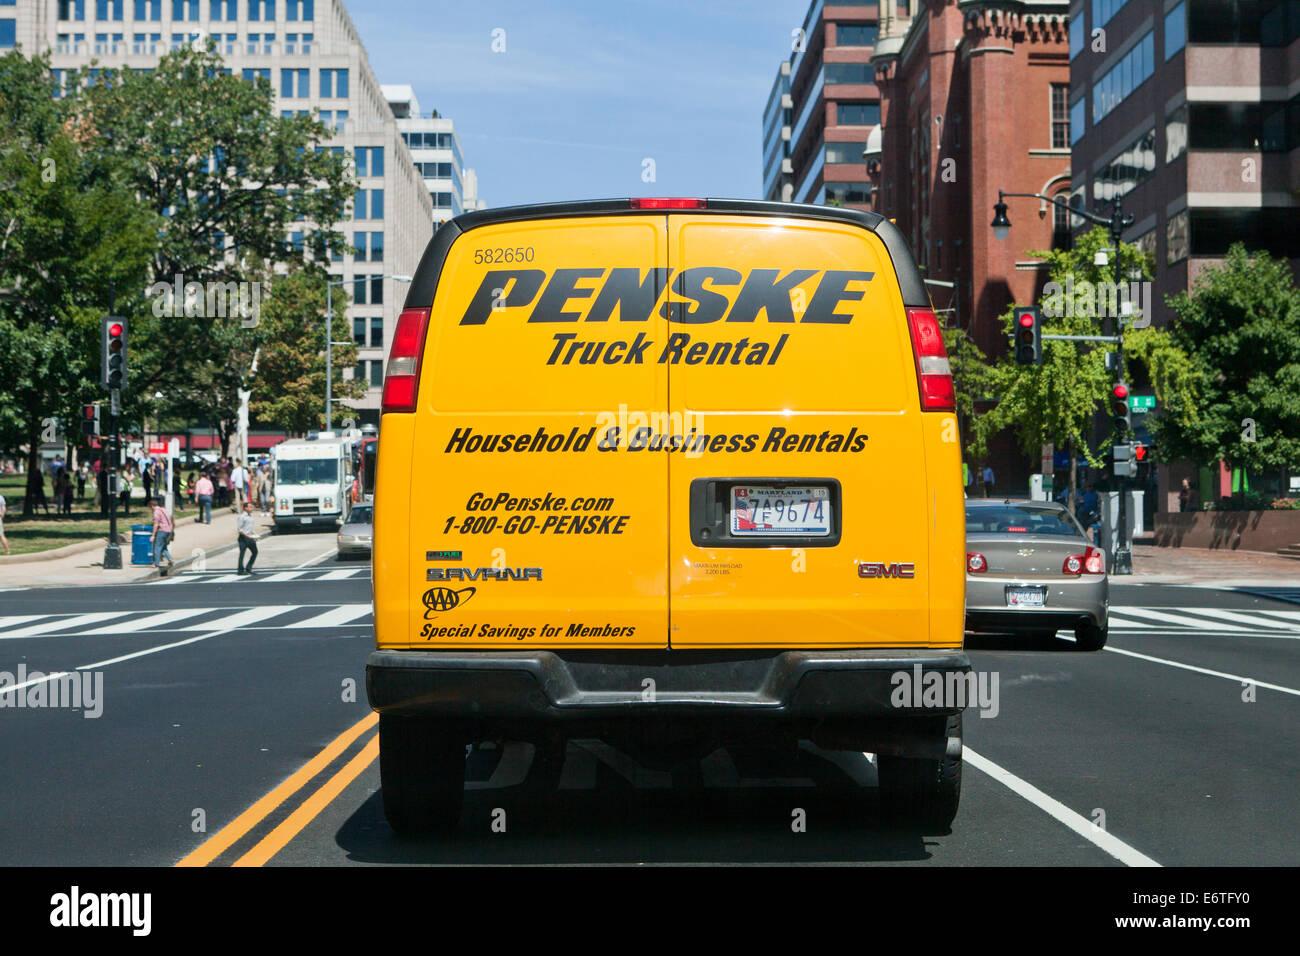 Penske Truck Rental Van From Behind Washington Dc Usa Stock Photo Alamy